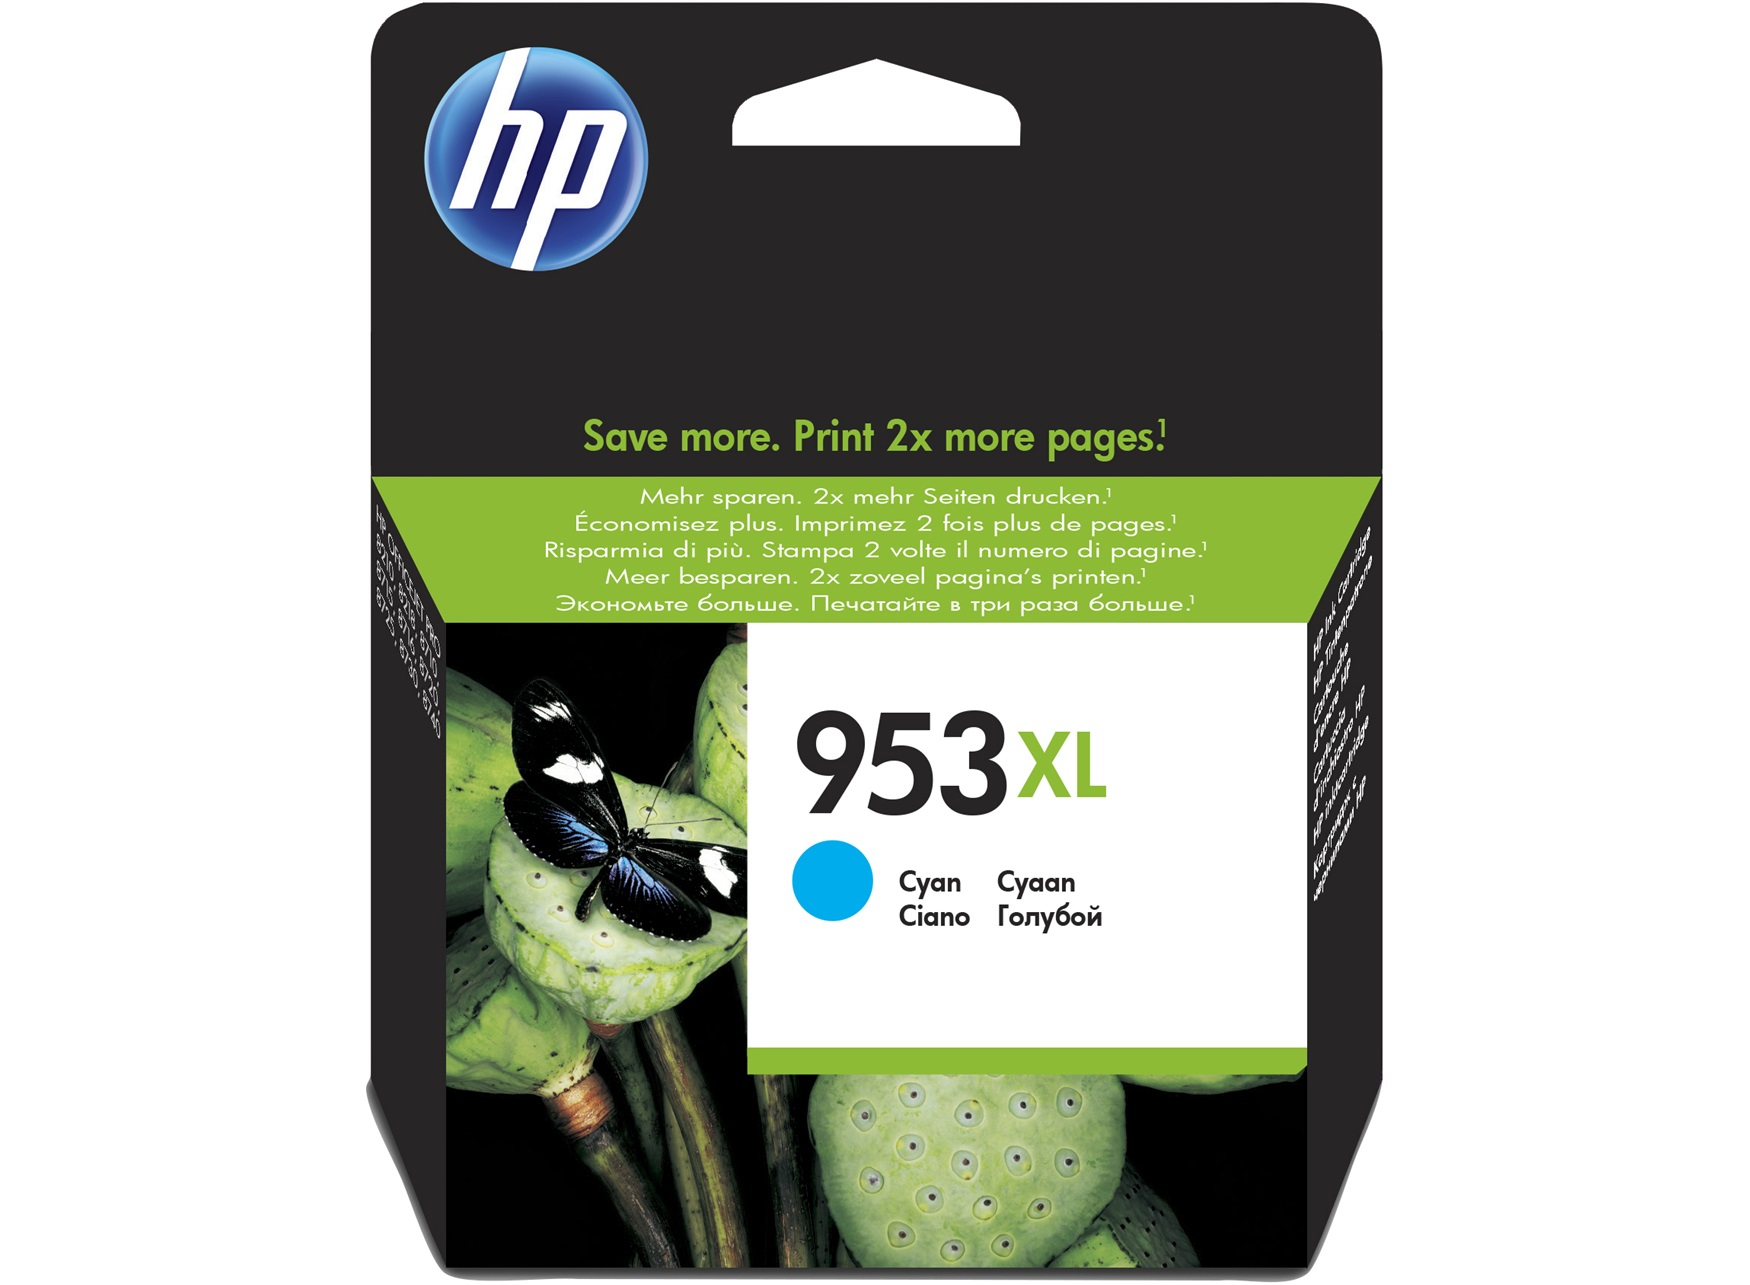 HP 953XL Cyan Original Ink Cartridge 20ml 1600pages Cyan ink cartridge